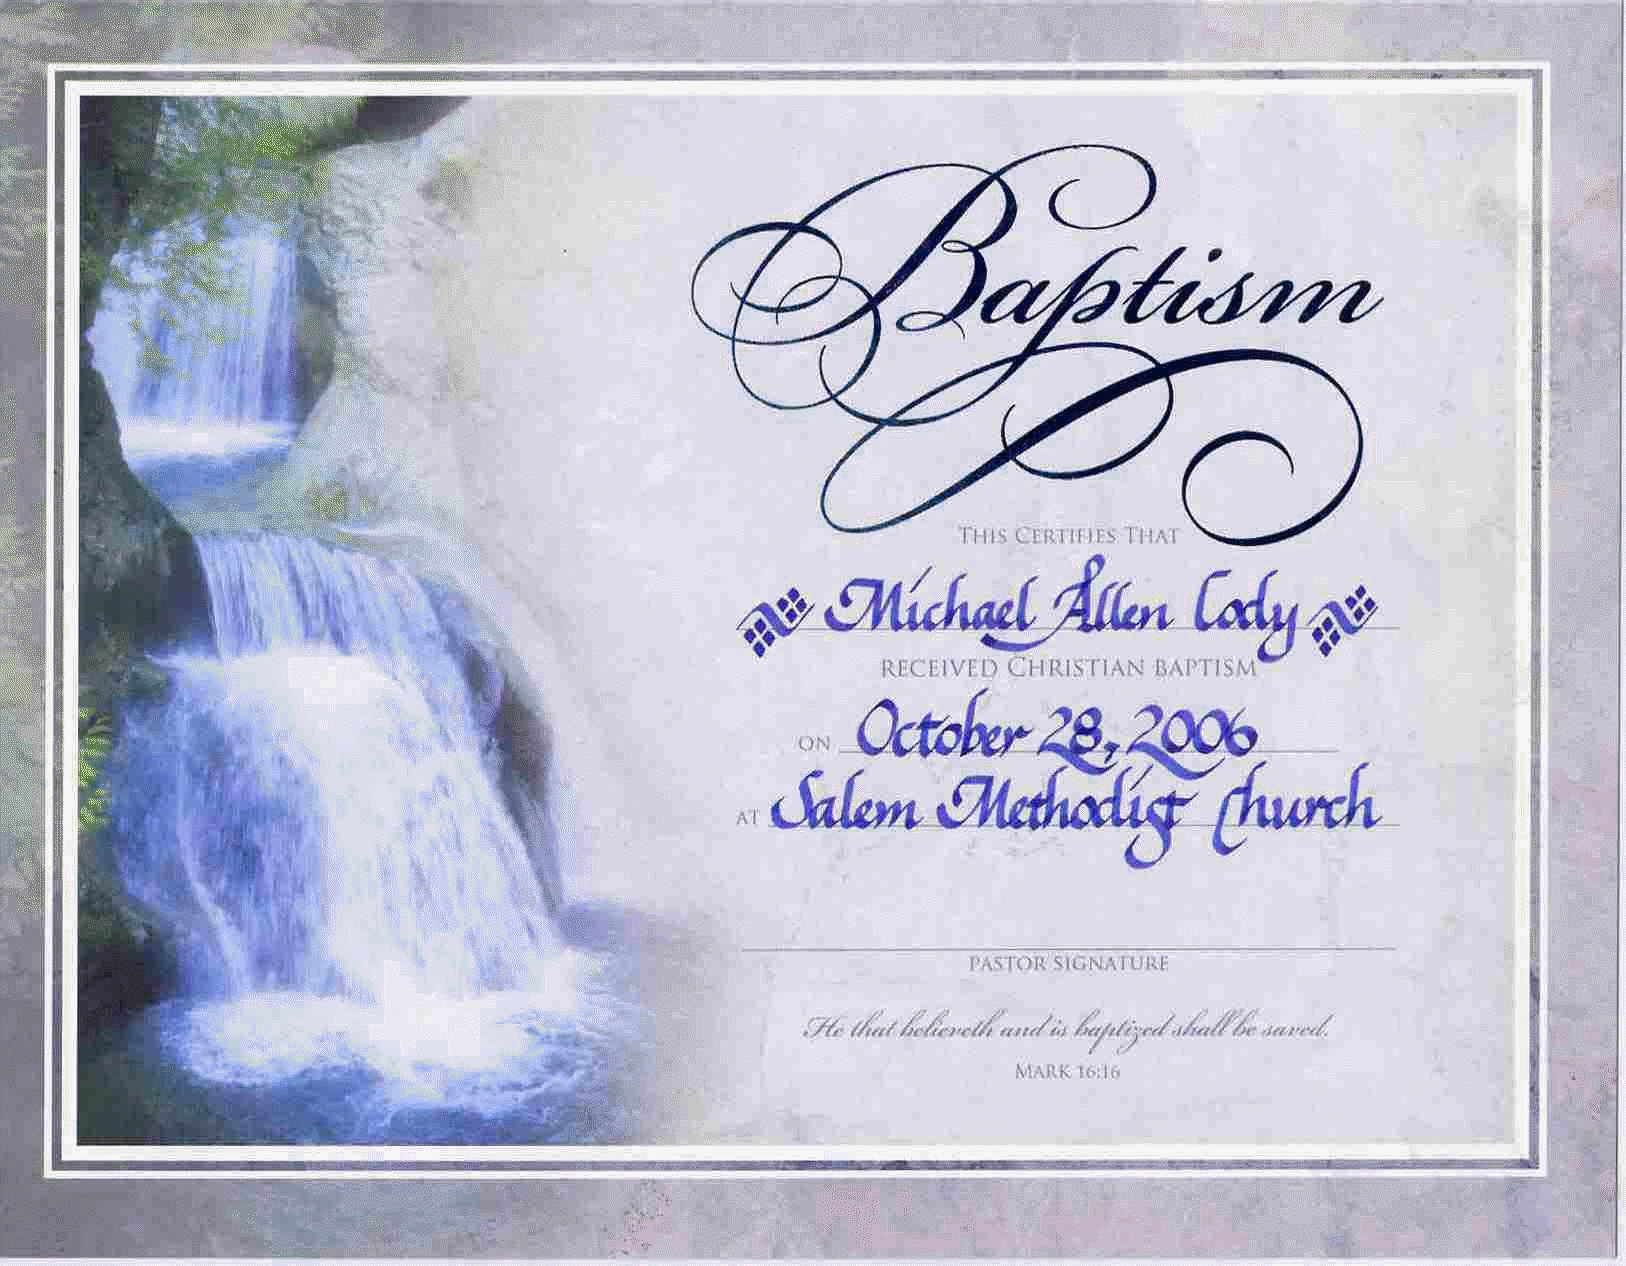 Water Baptism Certificate Templateencephaloscom Encephaloscom With Roman Catholic Baptism Certificate Template